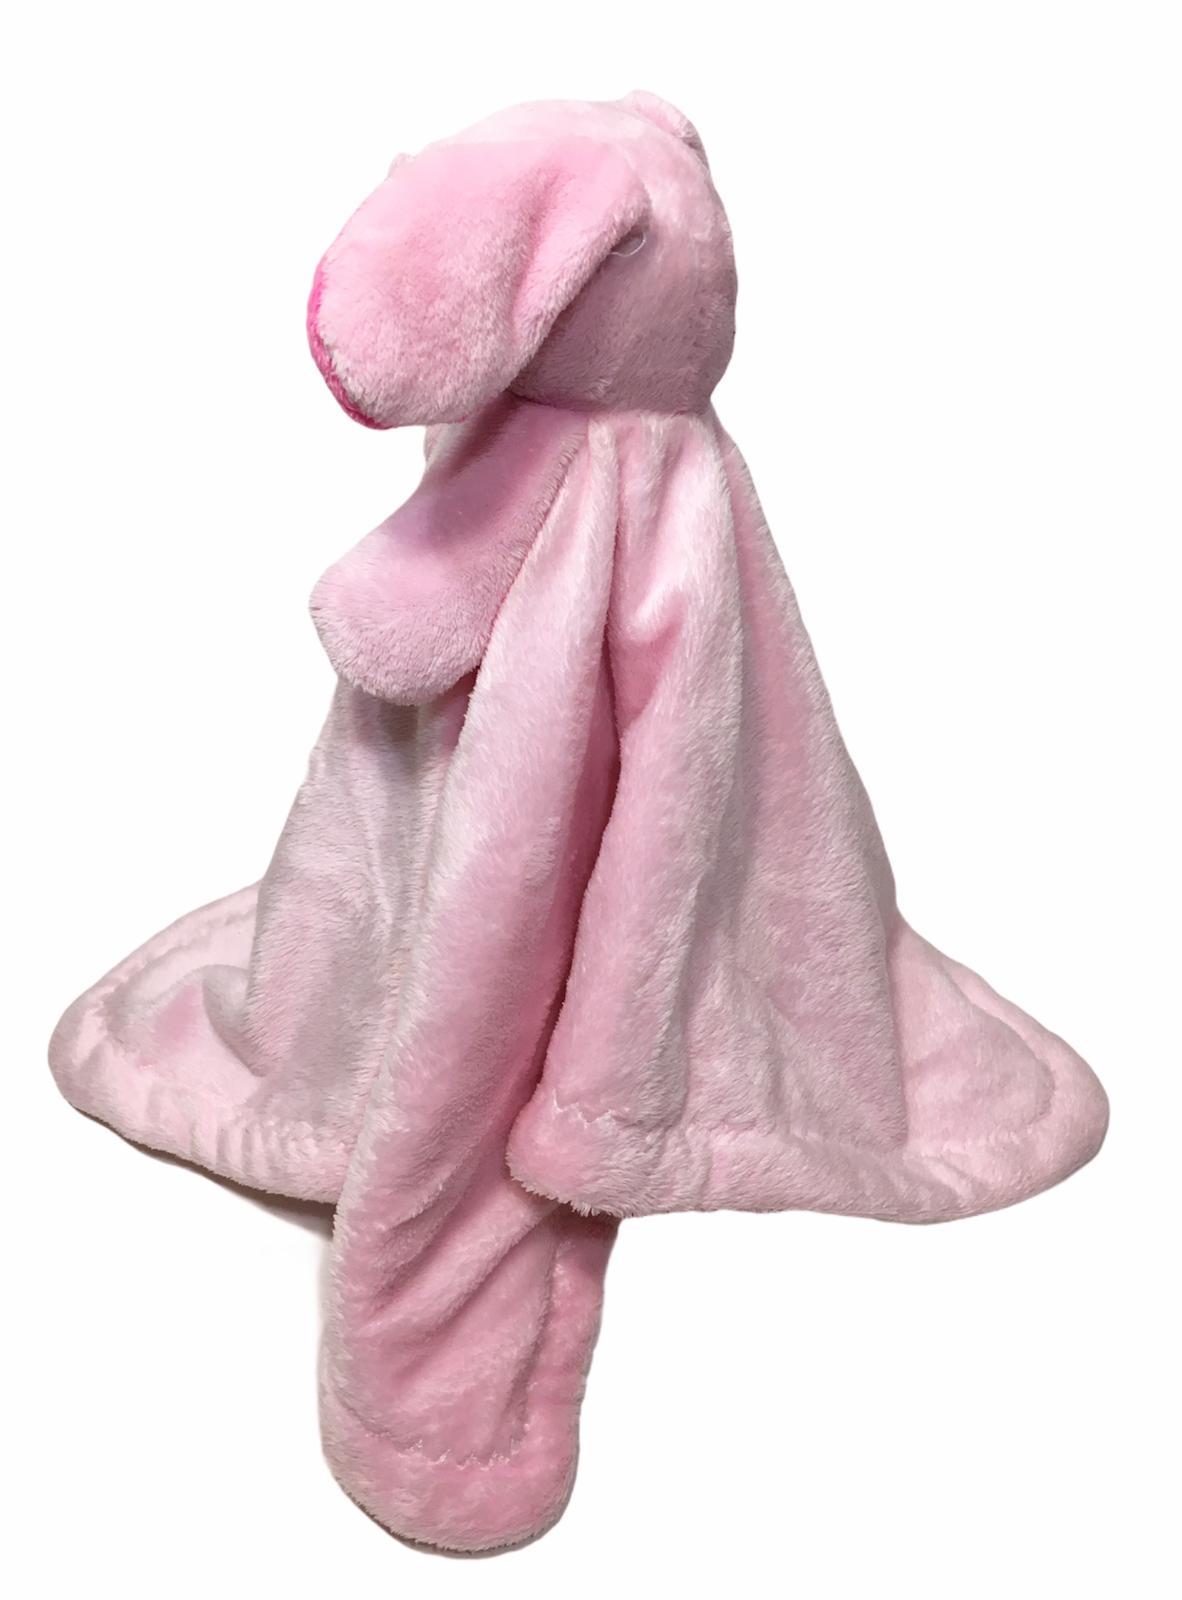 Blankets Beyond Pink Bunny Rabbit Security Blanket Lovie Lovey - $29.99